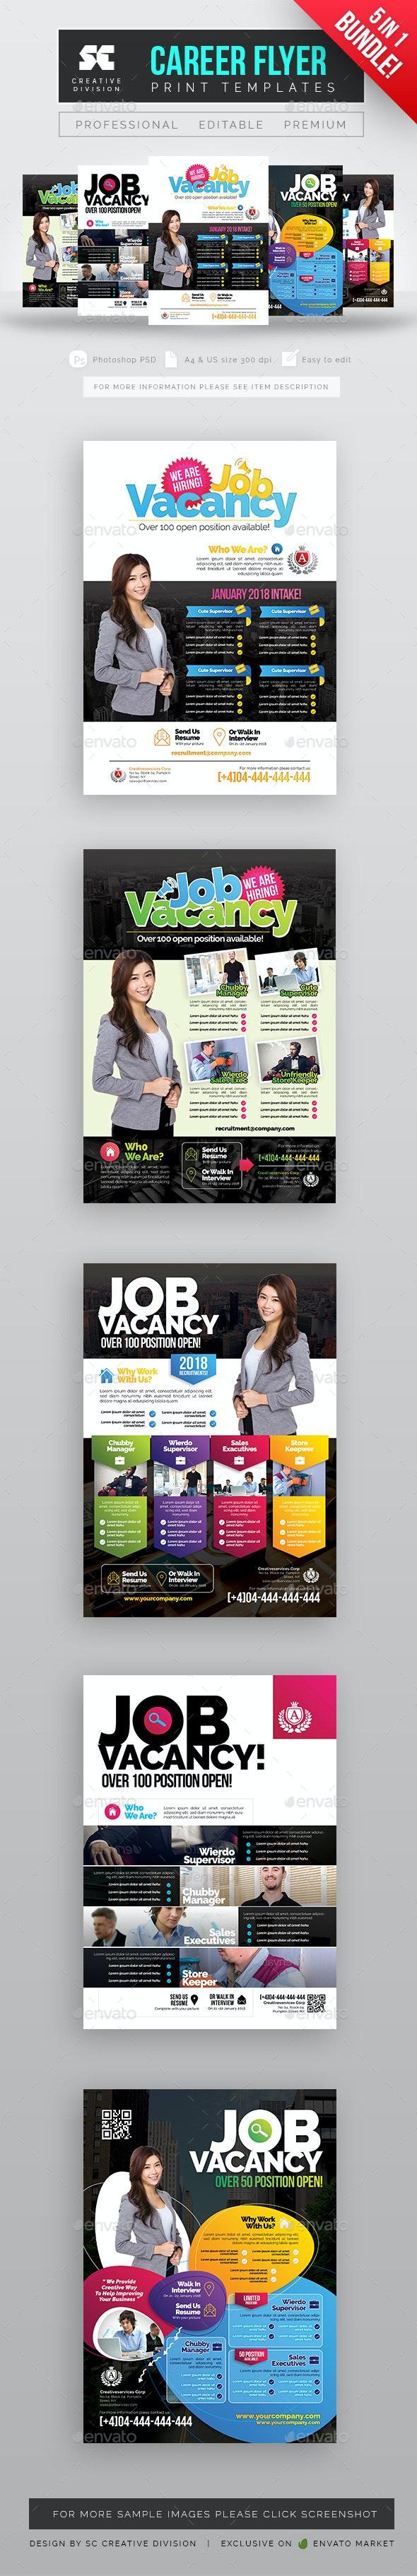 Job Vacancy Flyer Bundle - Corporate Flyers